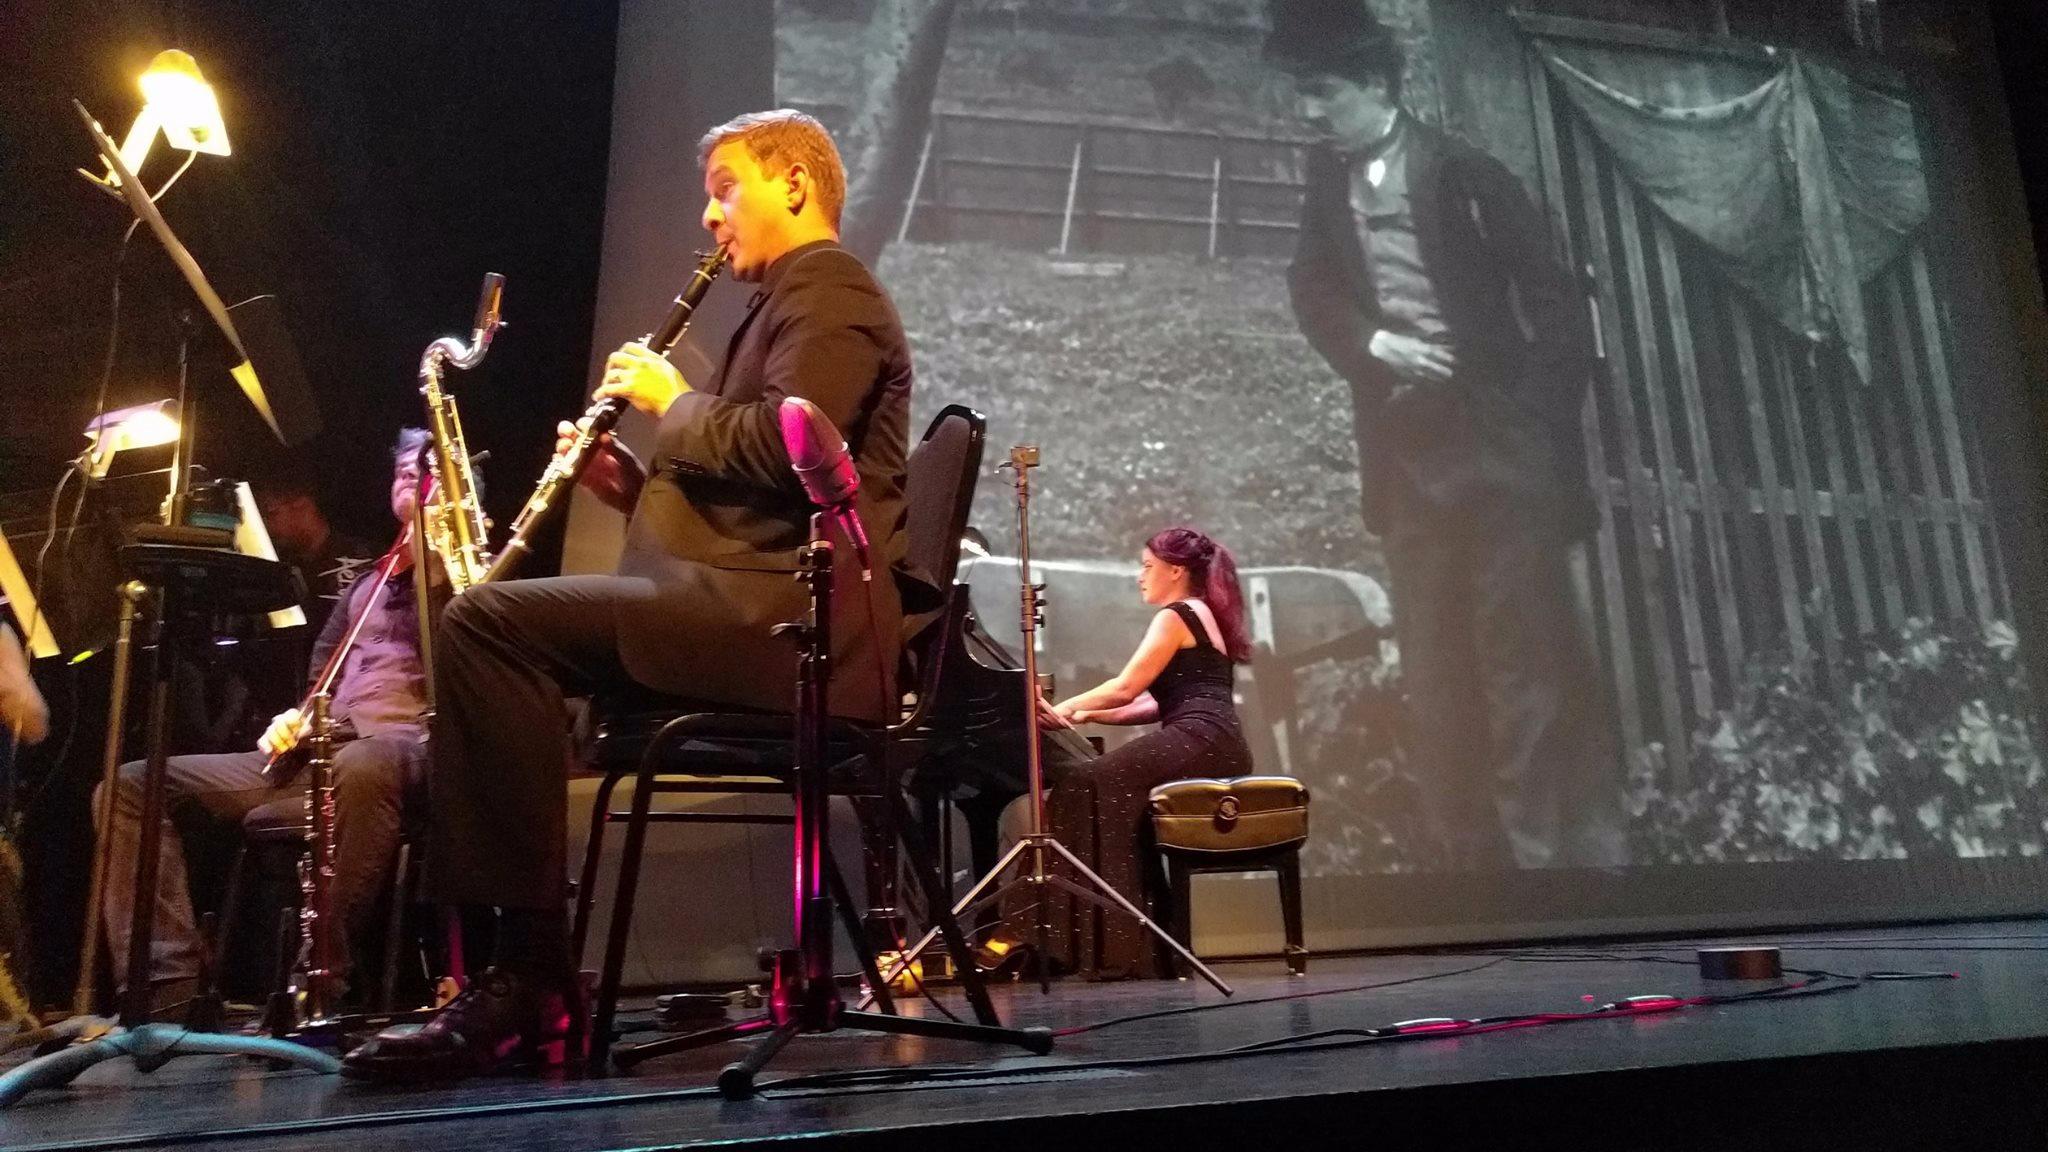 Performance by Chamber Music on the Fox in Elgin, Illinois, of The Tramp score, as part of the Elgin Short Film Festival 23 September 2017.